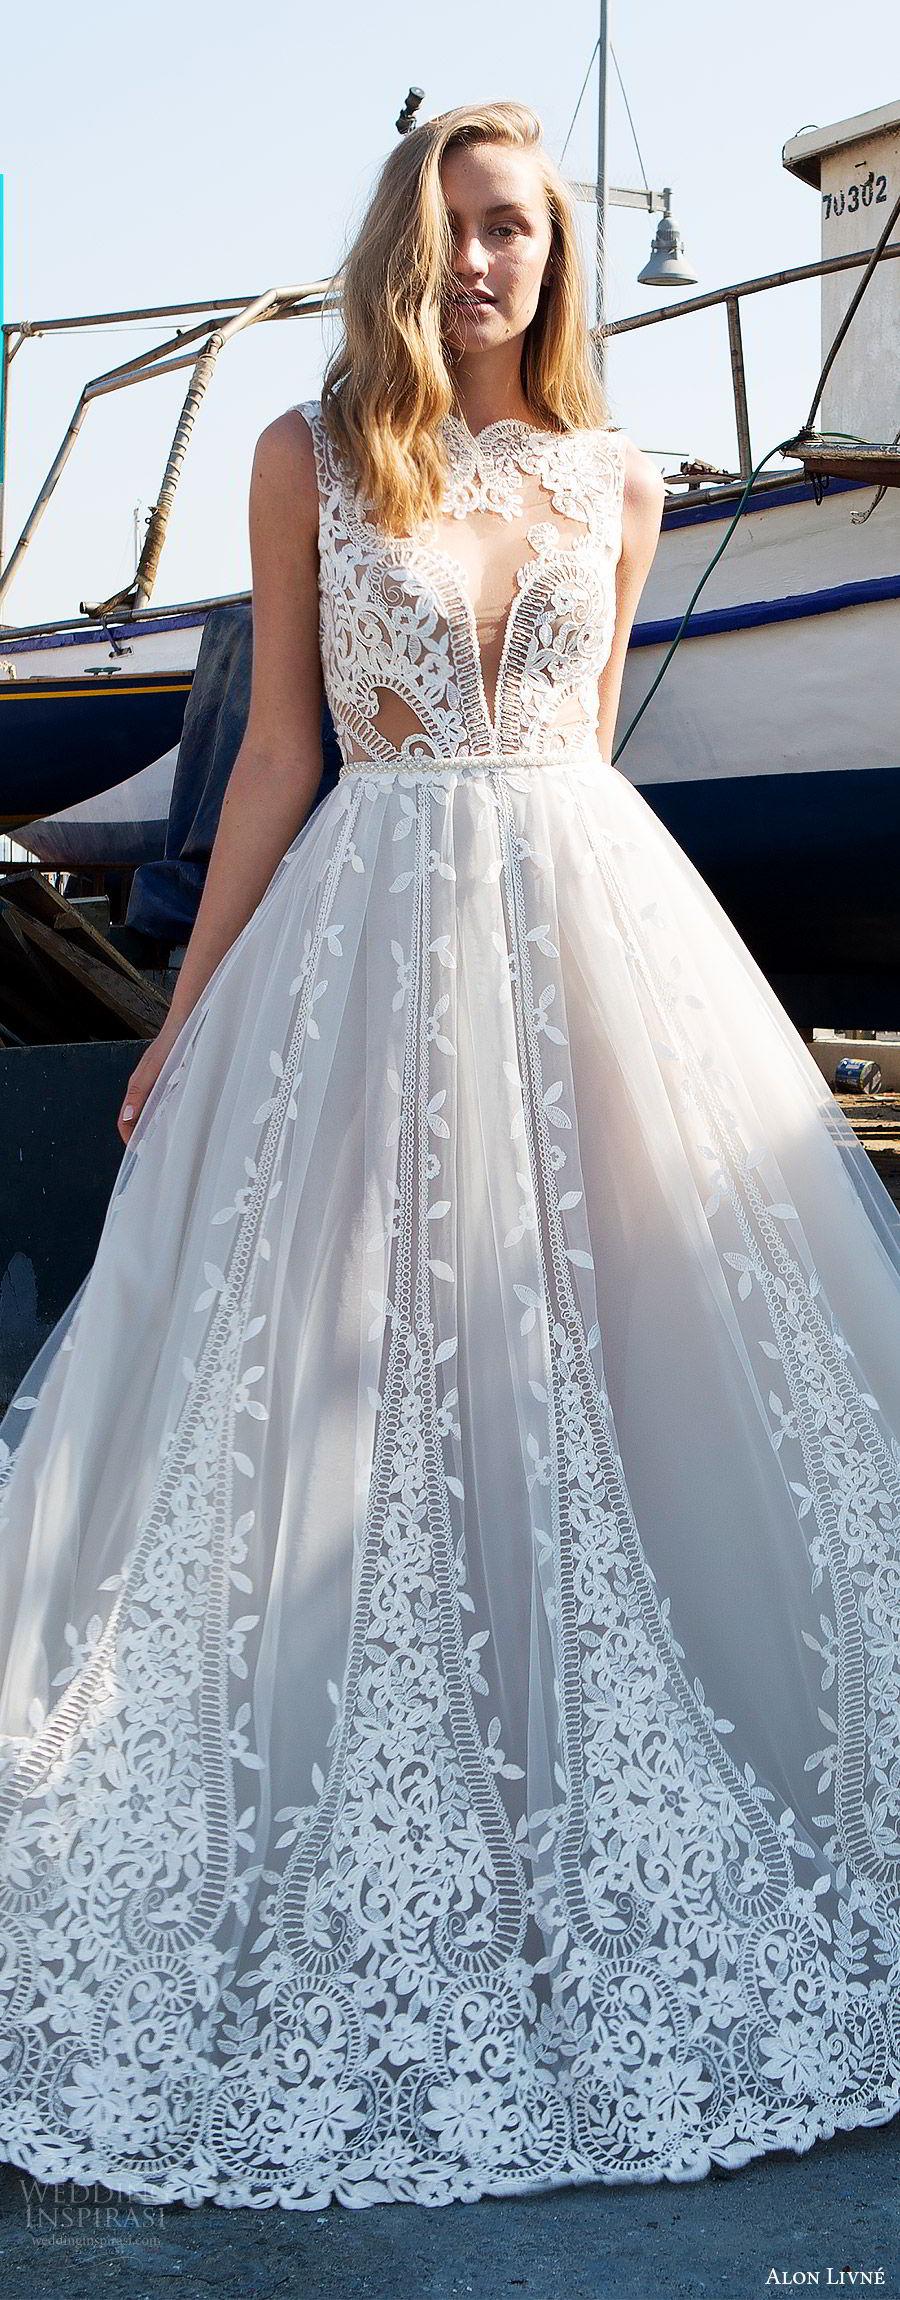 alon livne white pre 2018 bridal sleeveless jewel neck sheer bodice lace ball gown wedding dress (beatrice) zv princess romantic